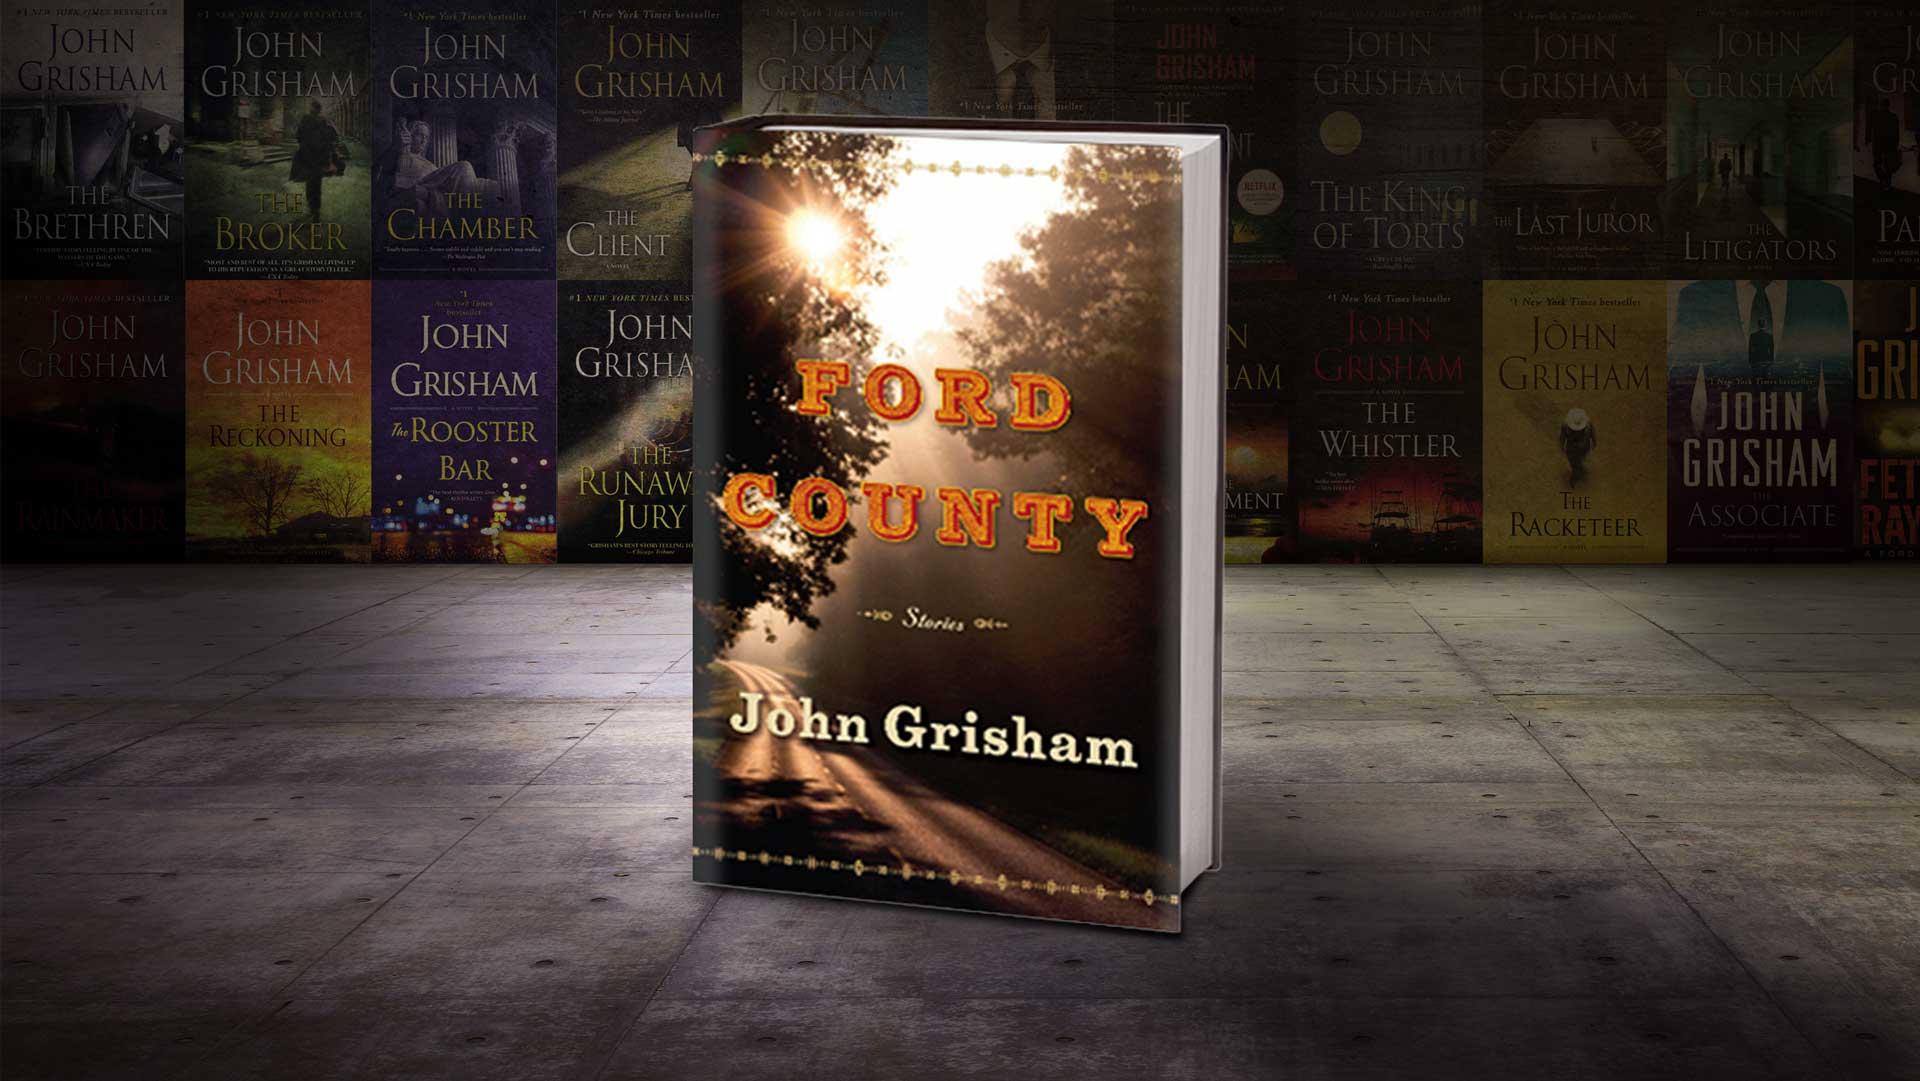 Ford County: Stories - John Grisham